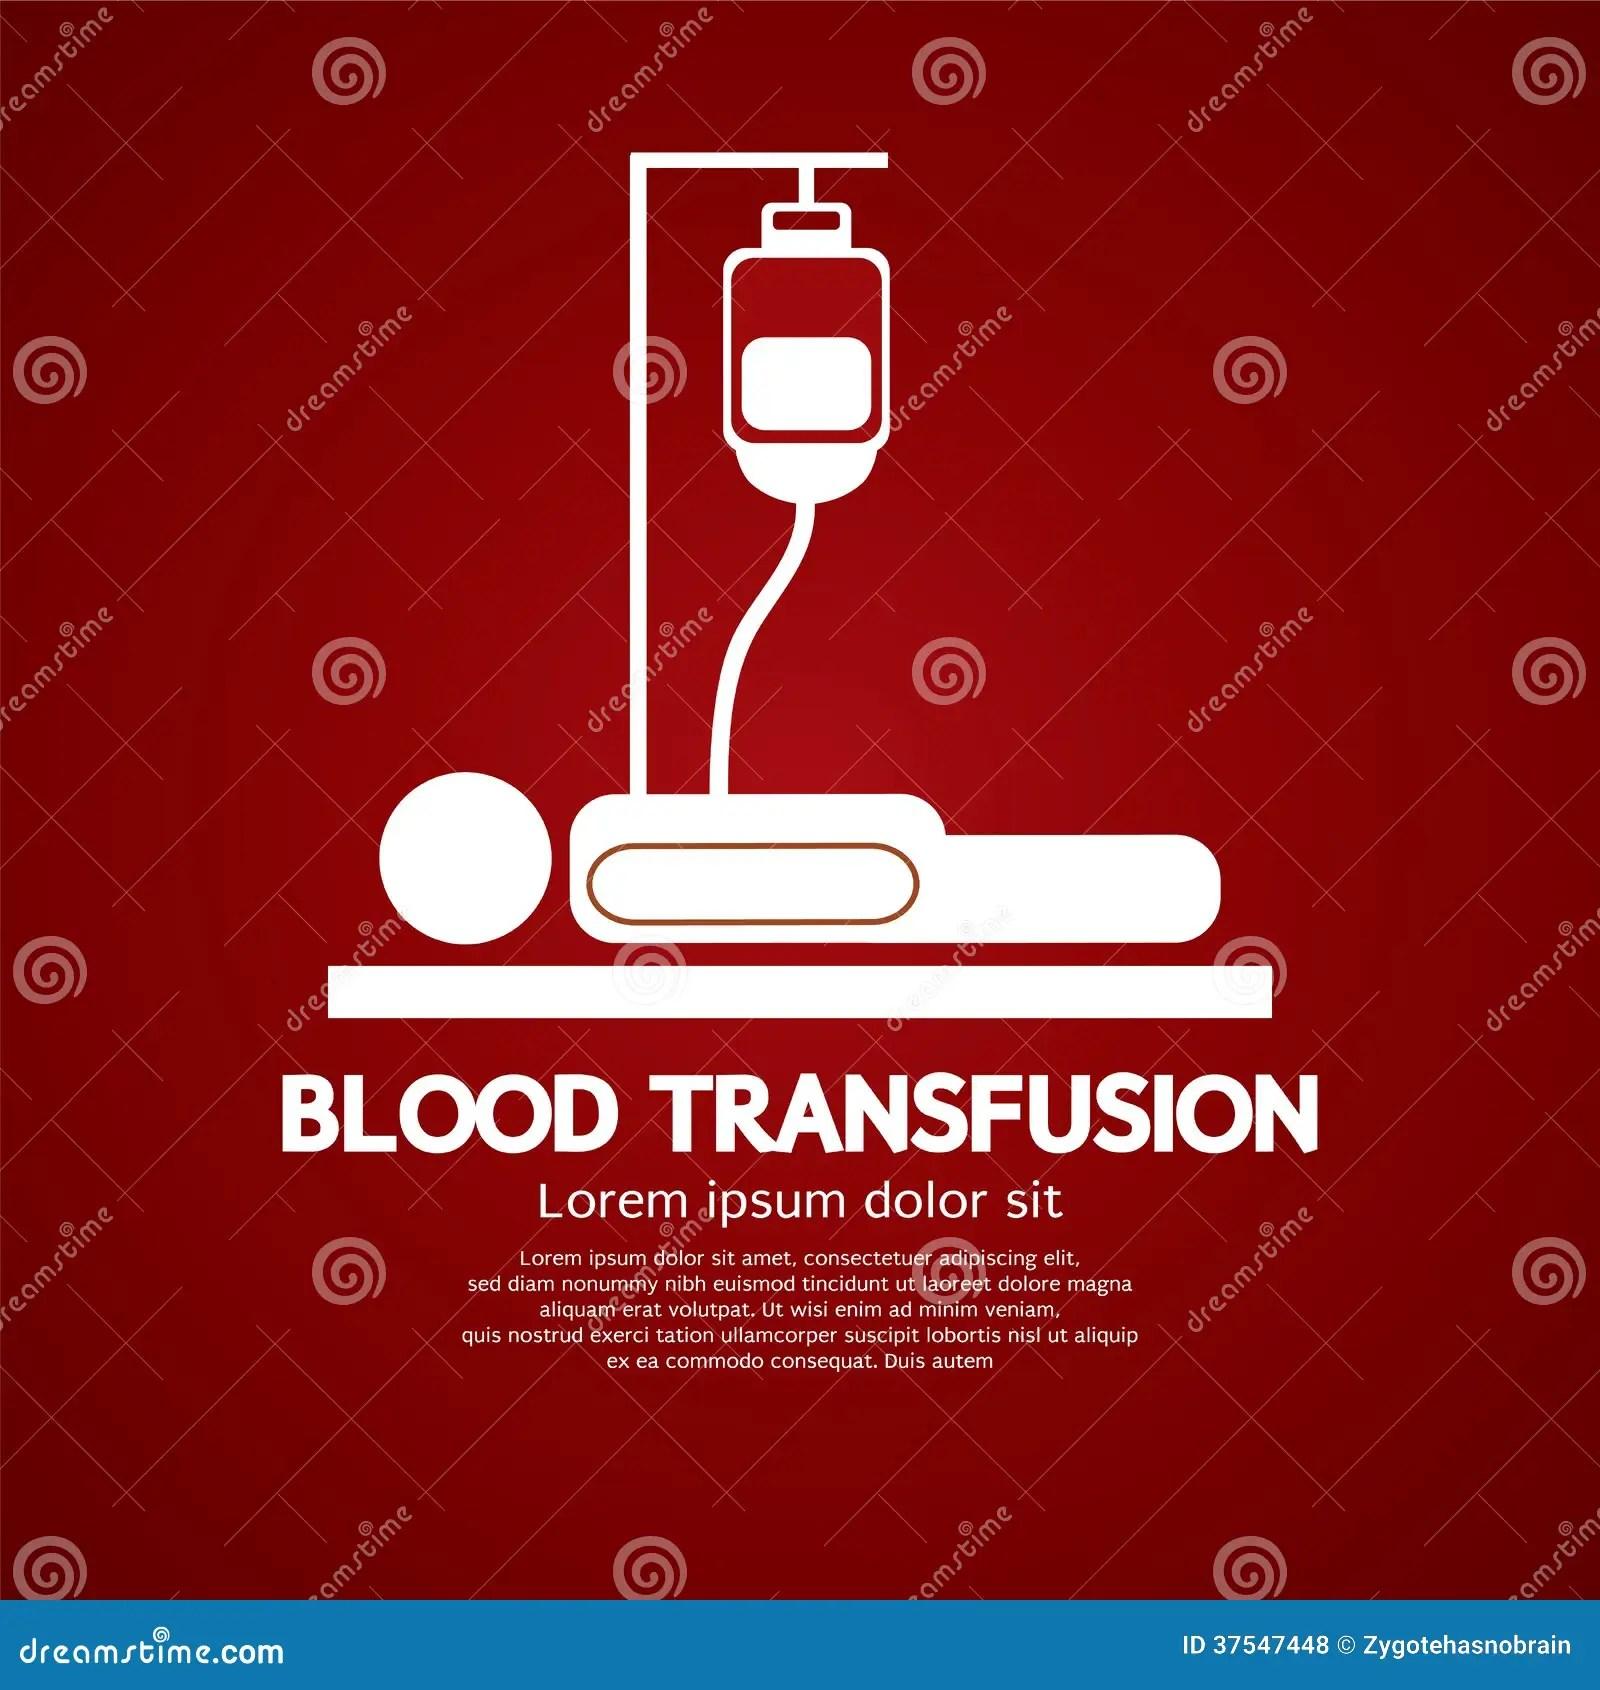 Blood Transfusion. Royalty Free Stock Photos - Image: 37547448